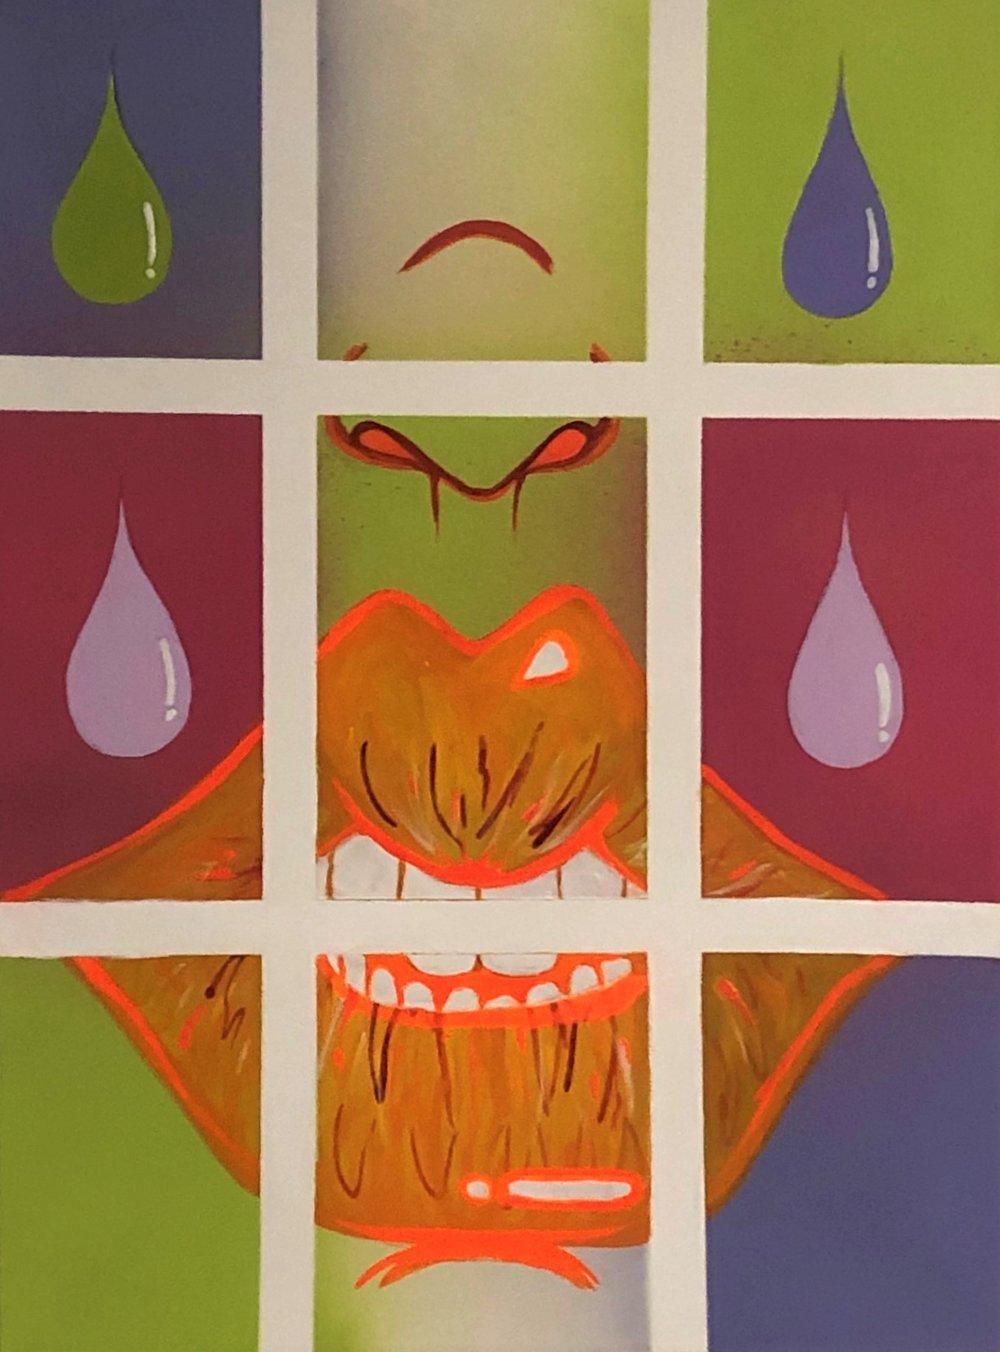 Mimi-Orange Resilience-Mixed Media on Canvas-18x24-2018-$550.jpg